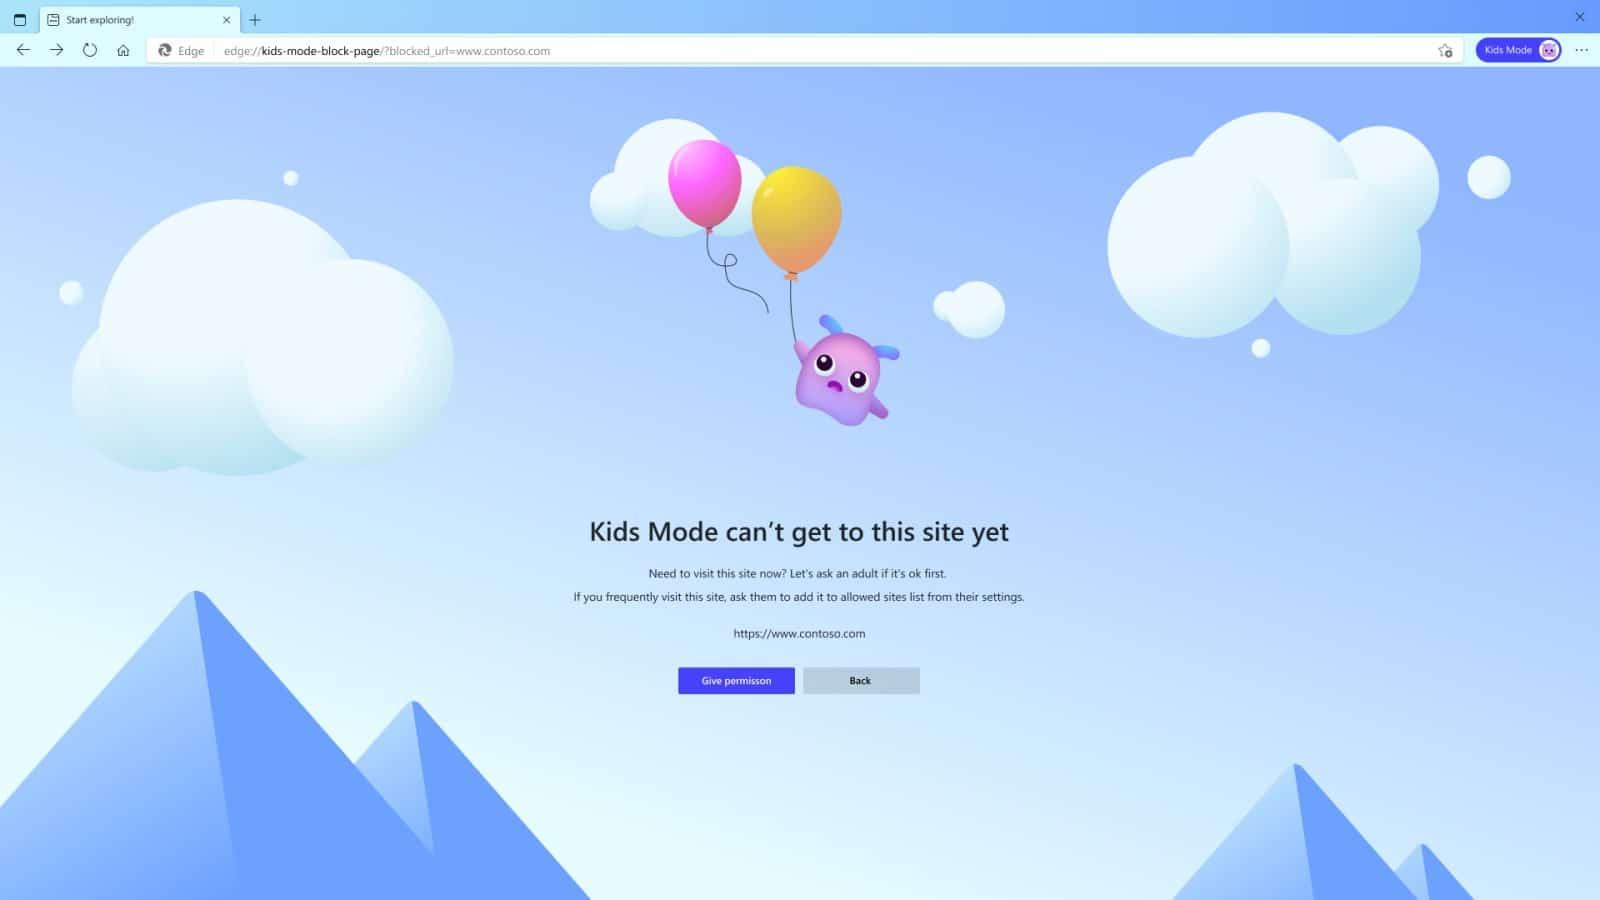 microsoft edge showing kids mode blocking a site